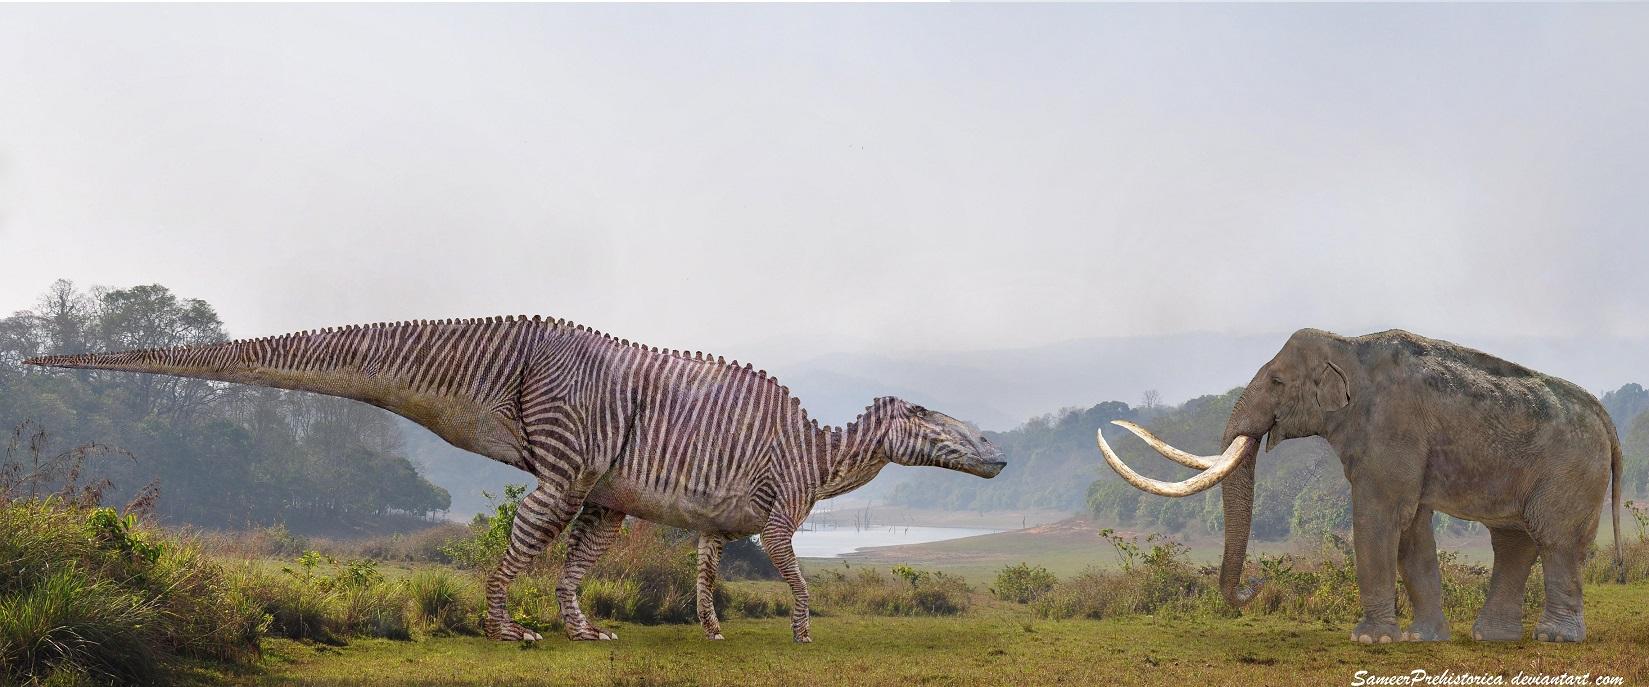 Shantungosaurus vs Steppe Mammoth by SameerPrehistorica on ...